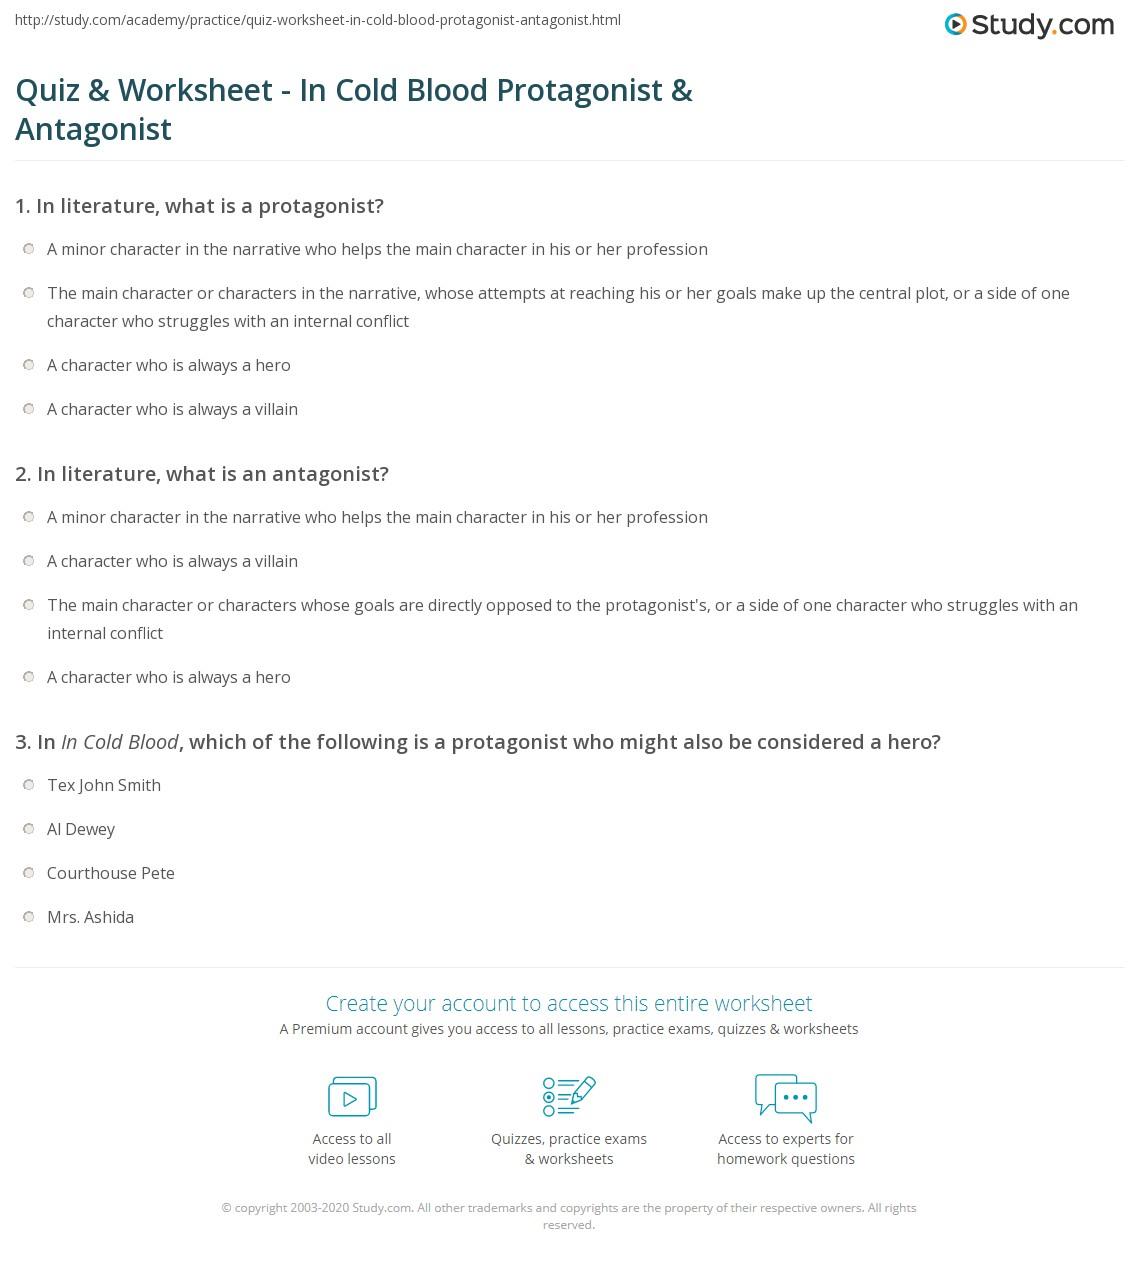 Quiz Worksheet In Cold Blood Protagonist Antagonist – Protagonist and Antagonist Worksheet